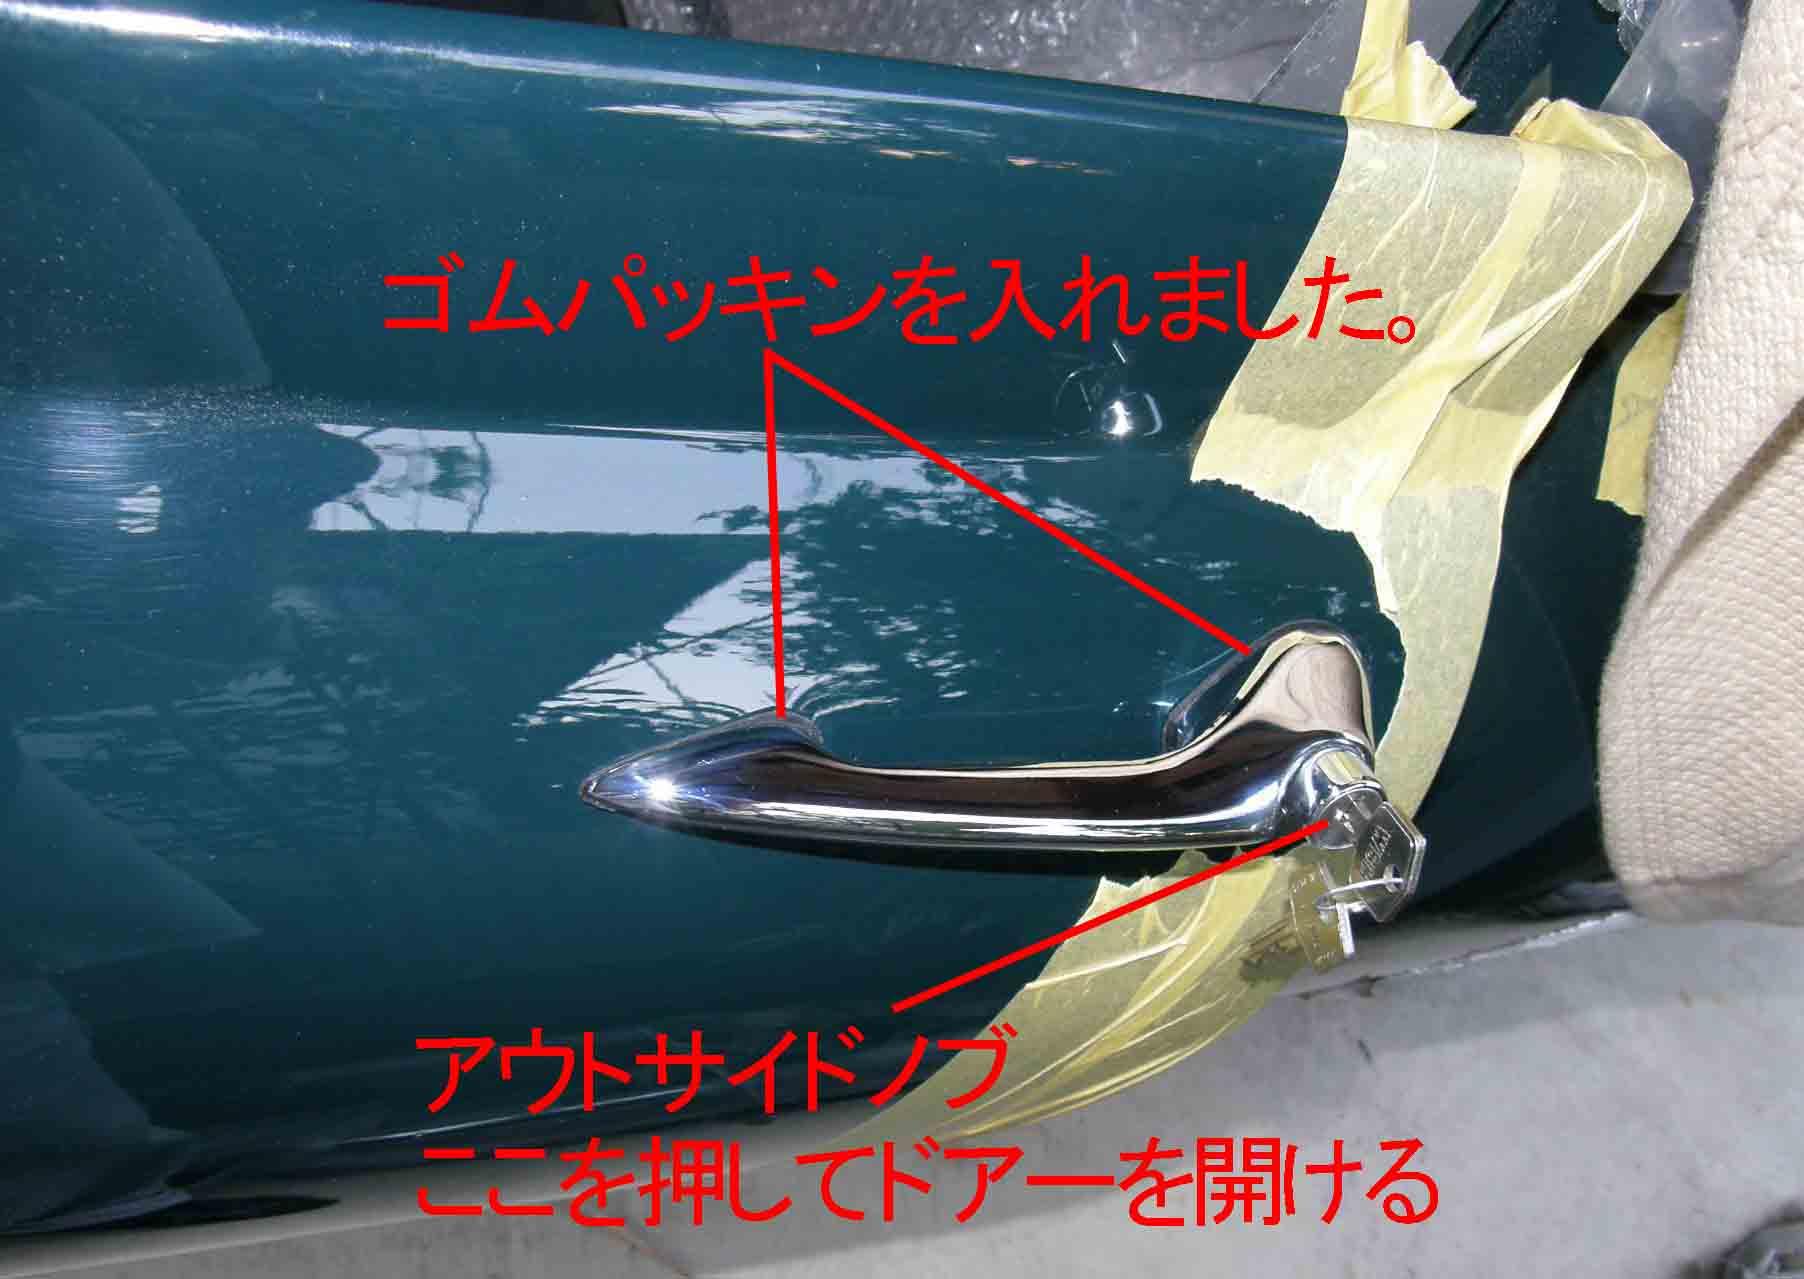 blogP6070011.jpg